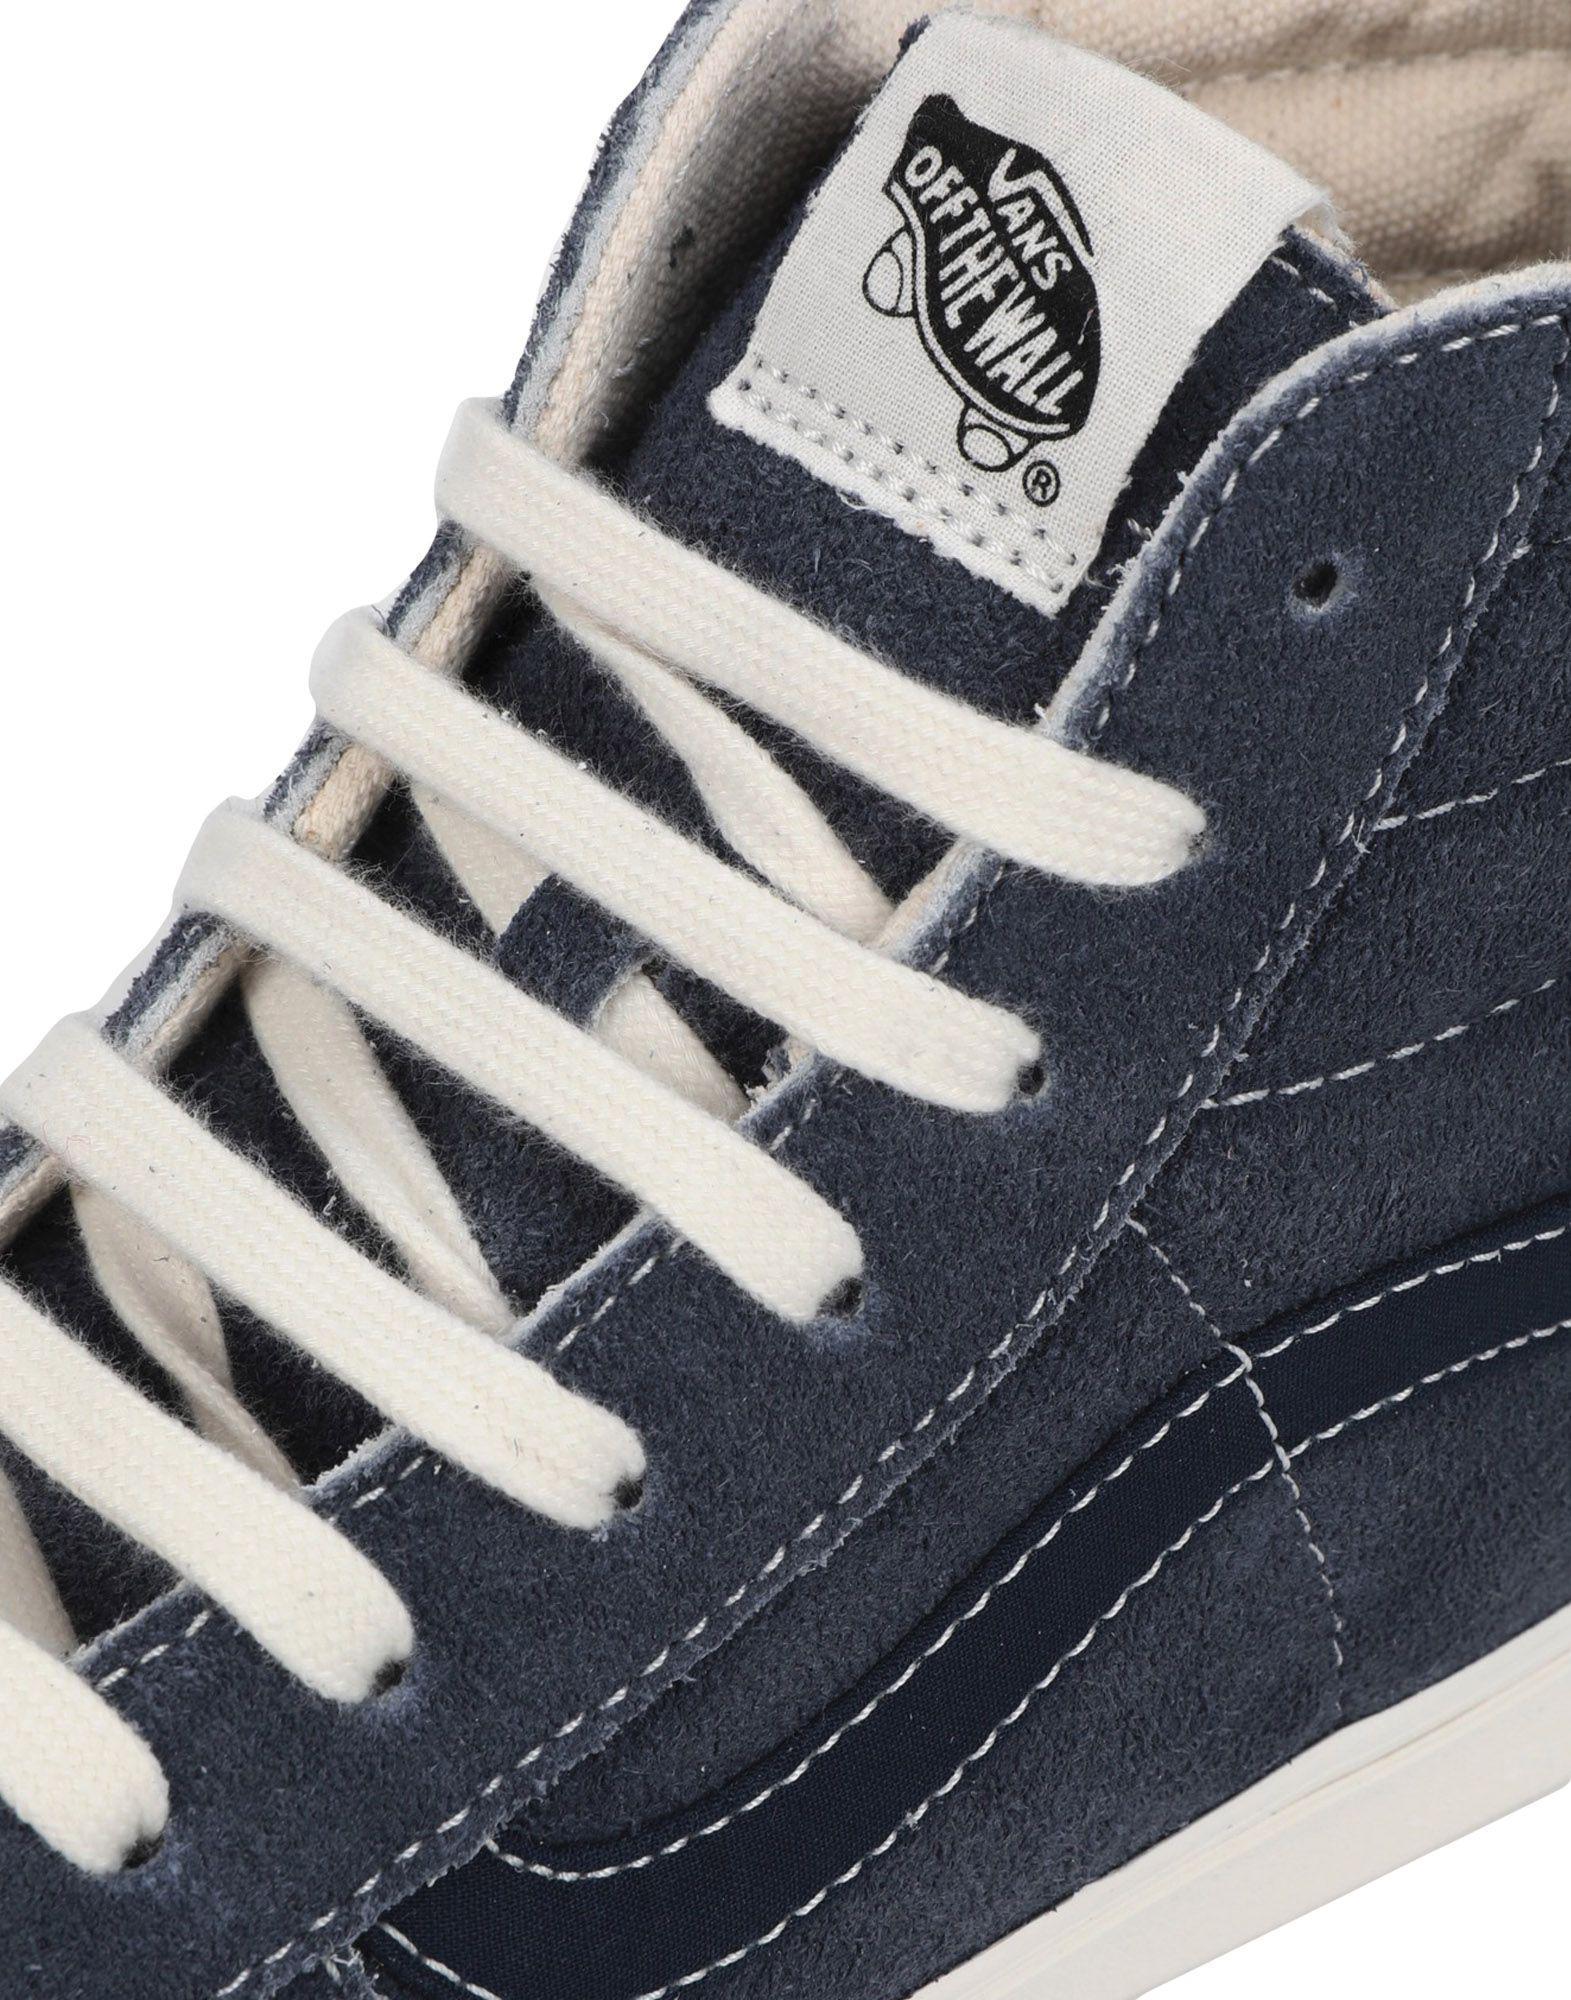 71283d06ad96bf Lyst - Vans High-tops   Sneakers in Blue for Men